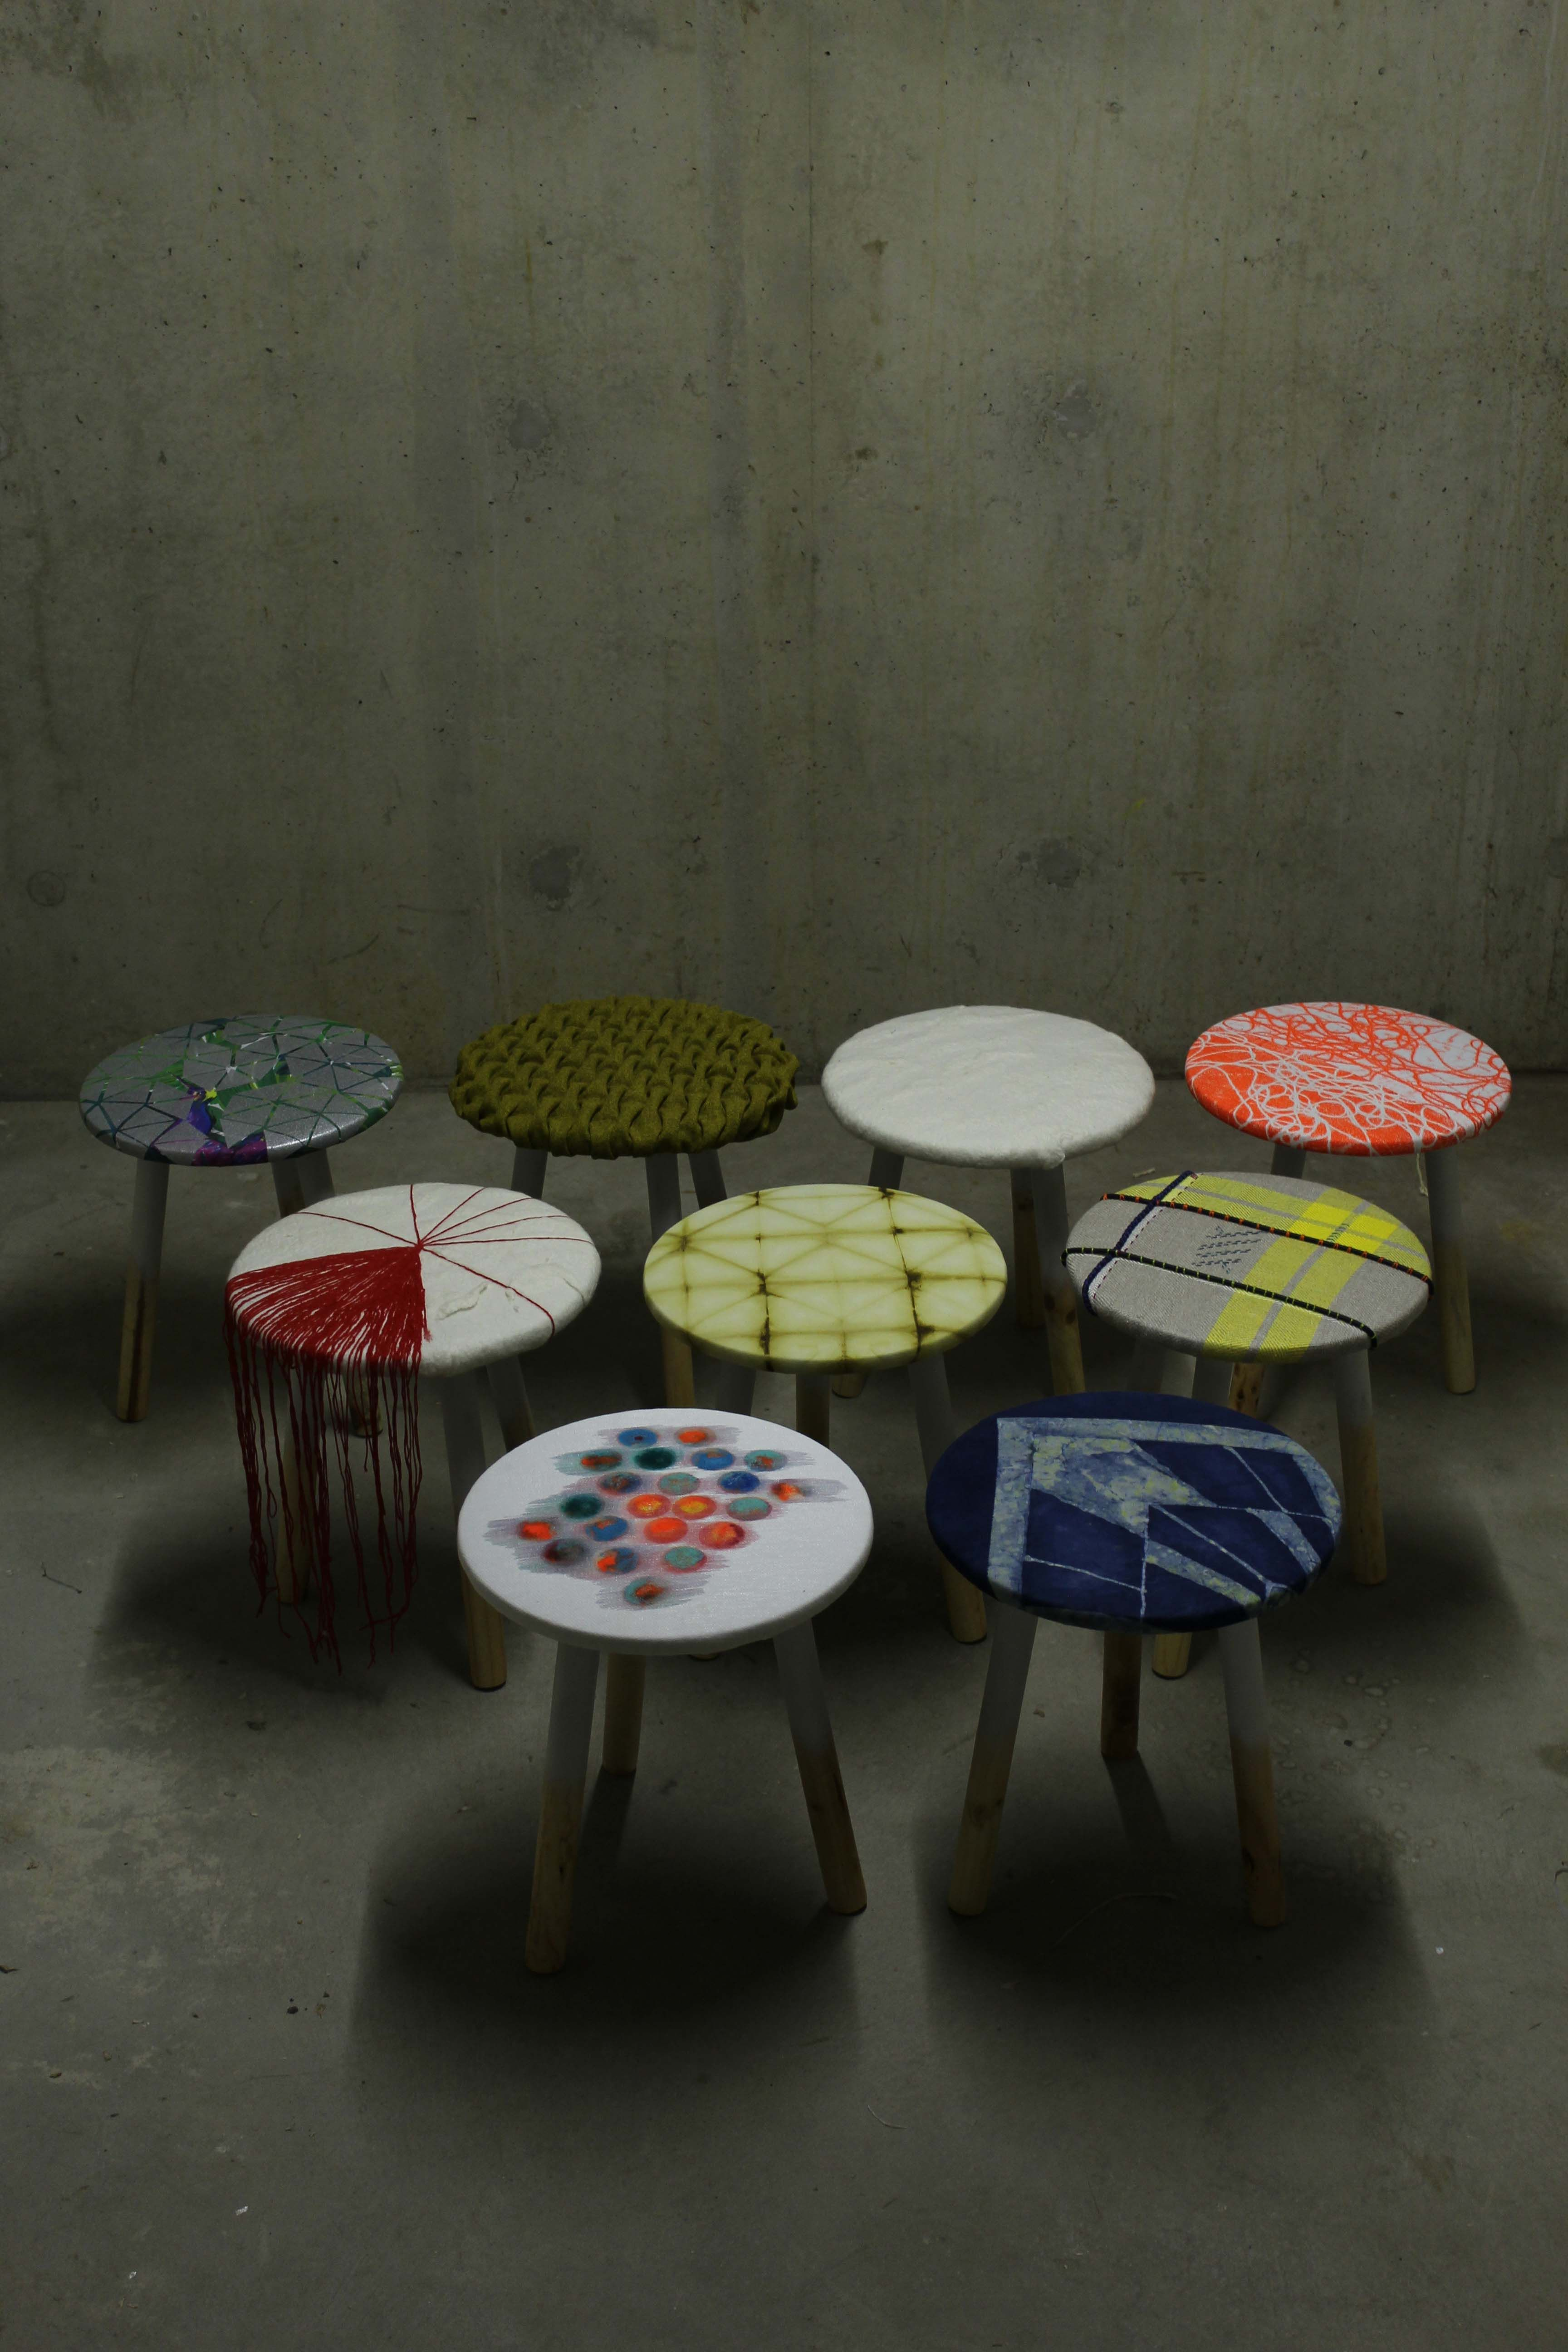 Krukjes diverse textieltechnieken © Mariken Dormans